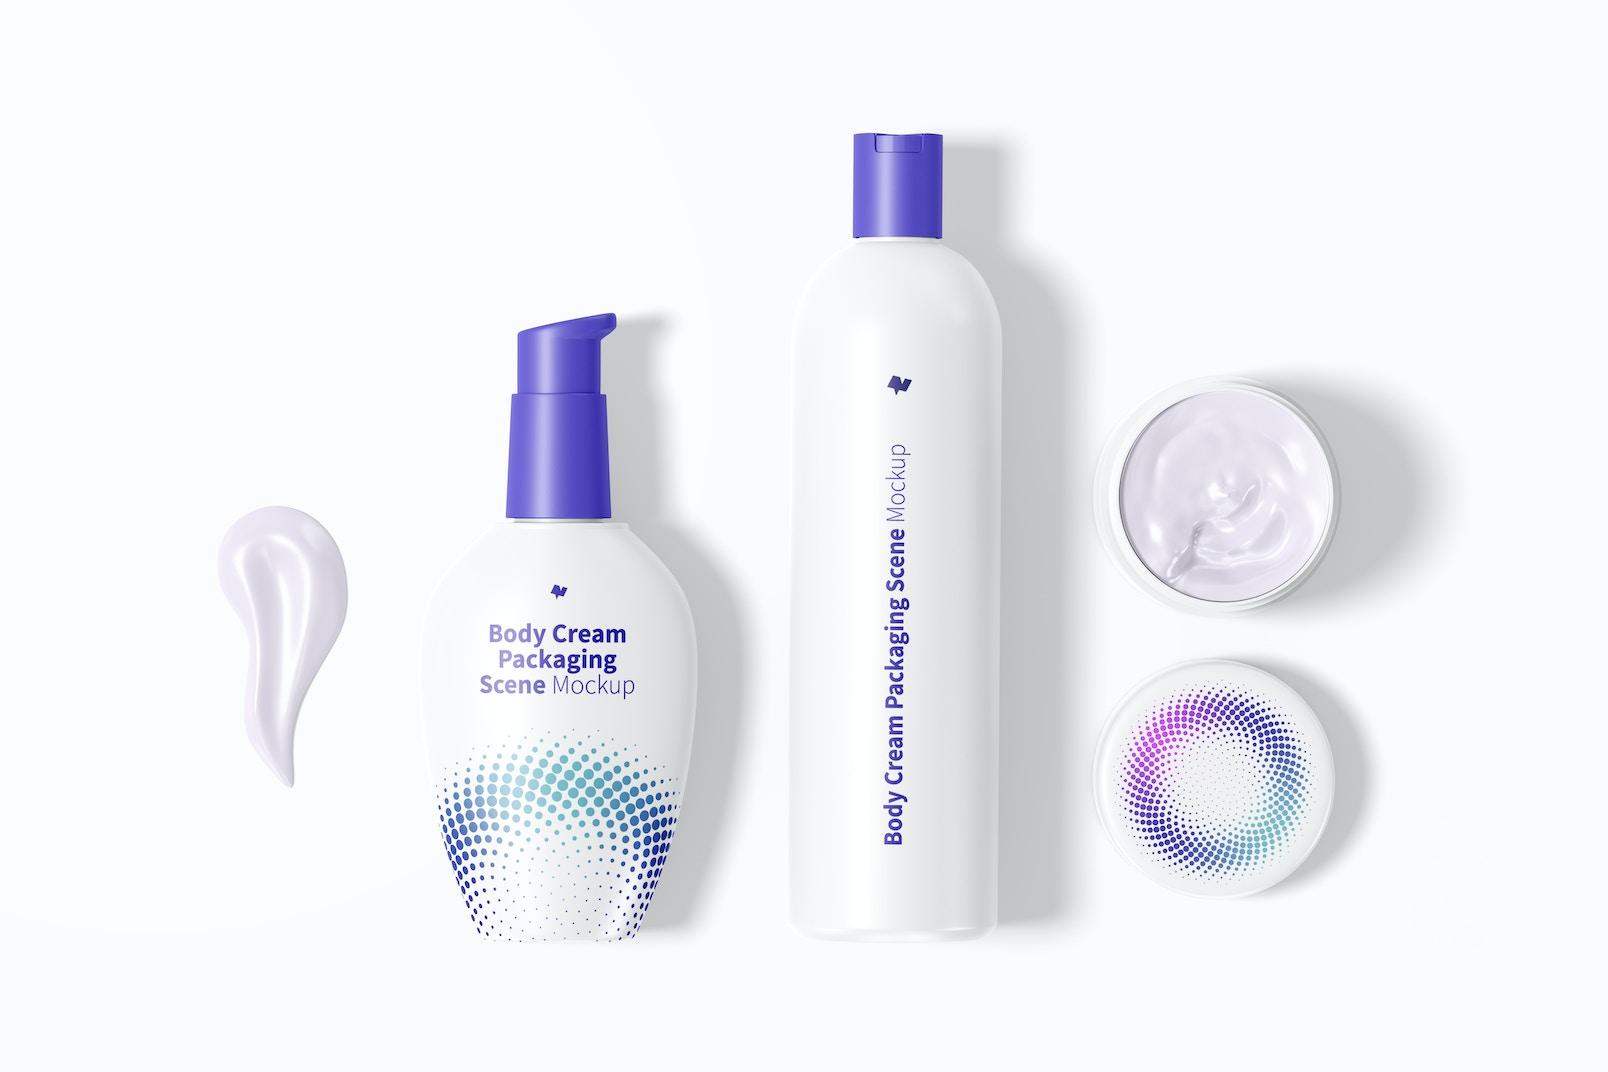 Body Cream Packaging Scene Mockup, Top View